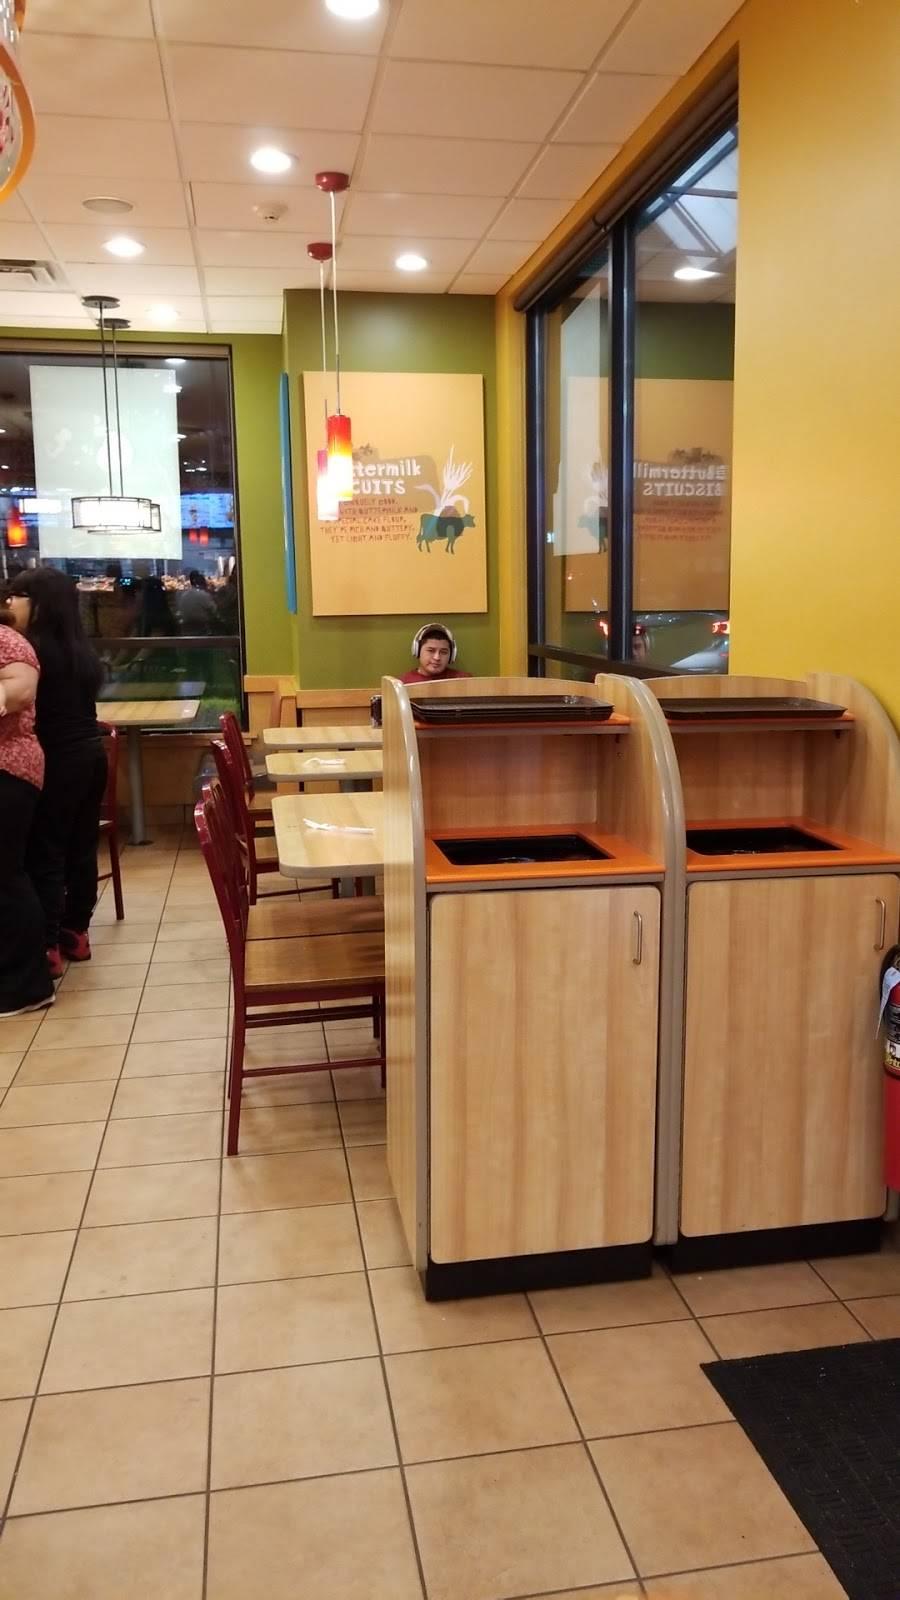 Popeyes Louisiana Kitchen | restaurant | 523 Flatbush Ave, Hartford, CT 06106, USA | 8607270201 OR +1 860-727-0201